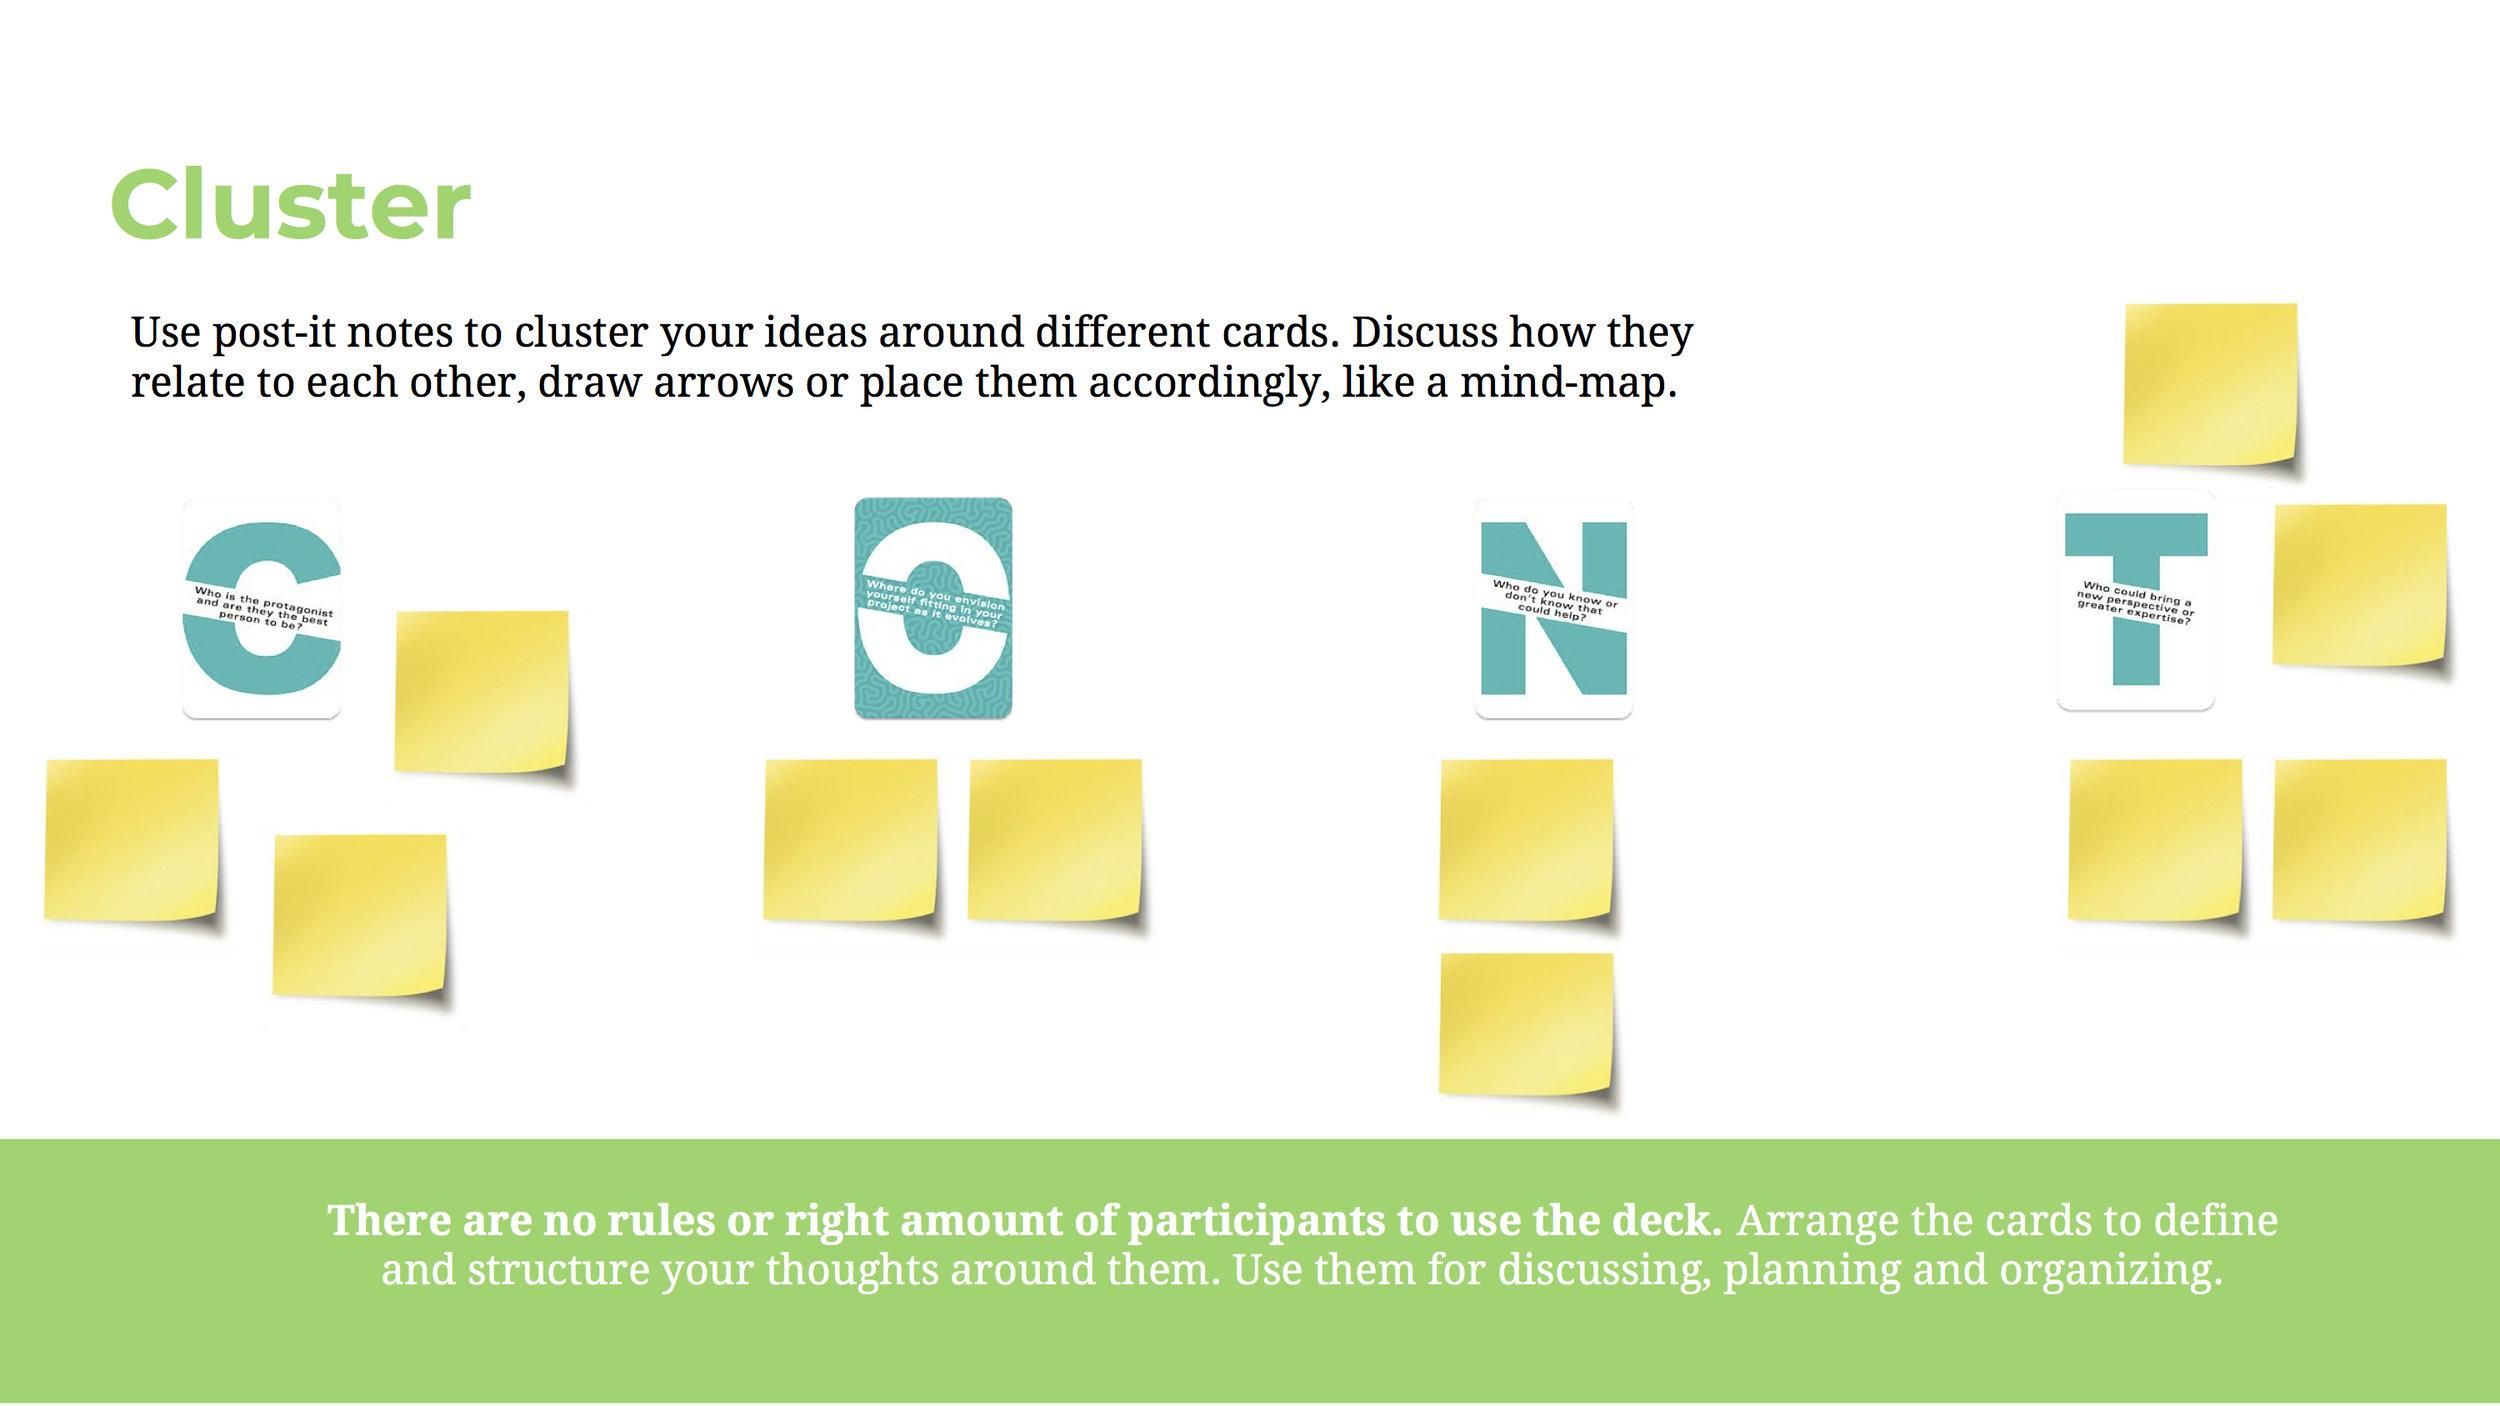 Purpose Design Final Slideshow29.jpg